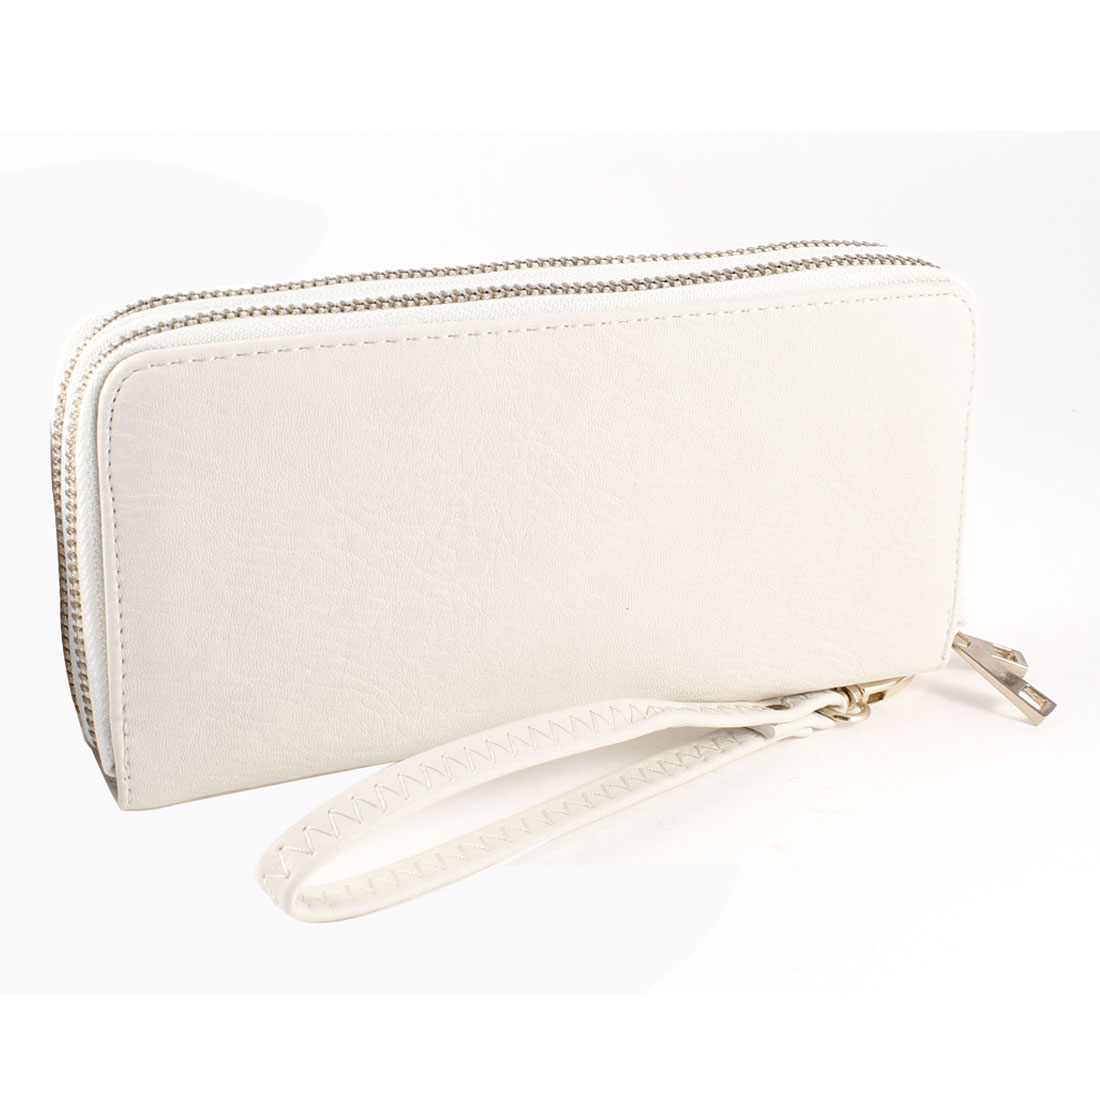 Lady White Faux Leather 2 Layers Zip up L-Shape Wrist Strap Wallet Purse